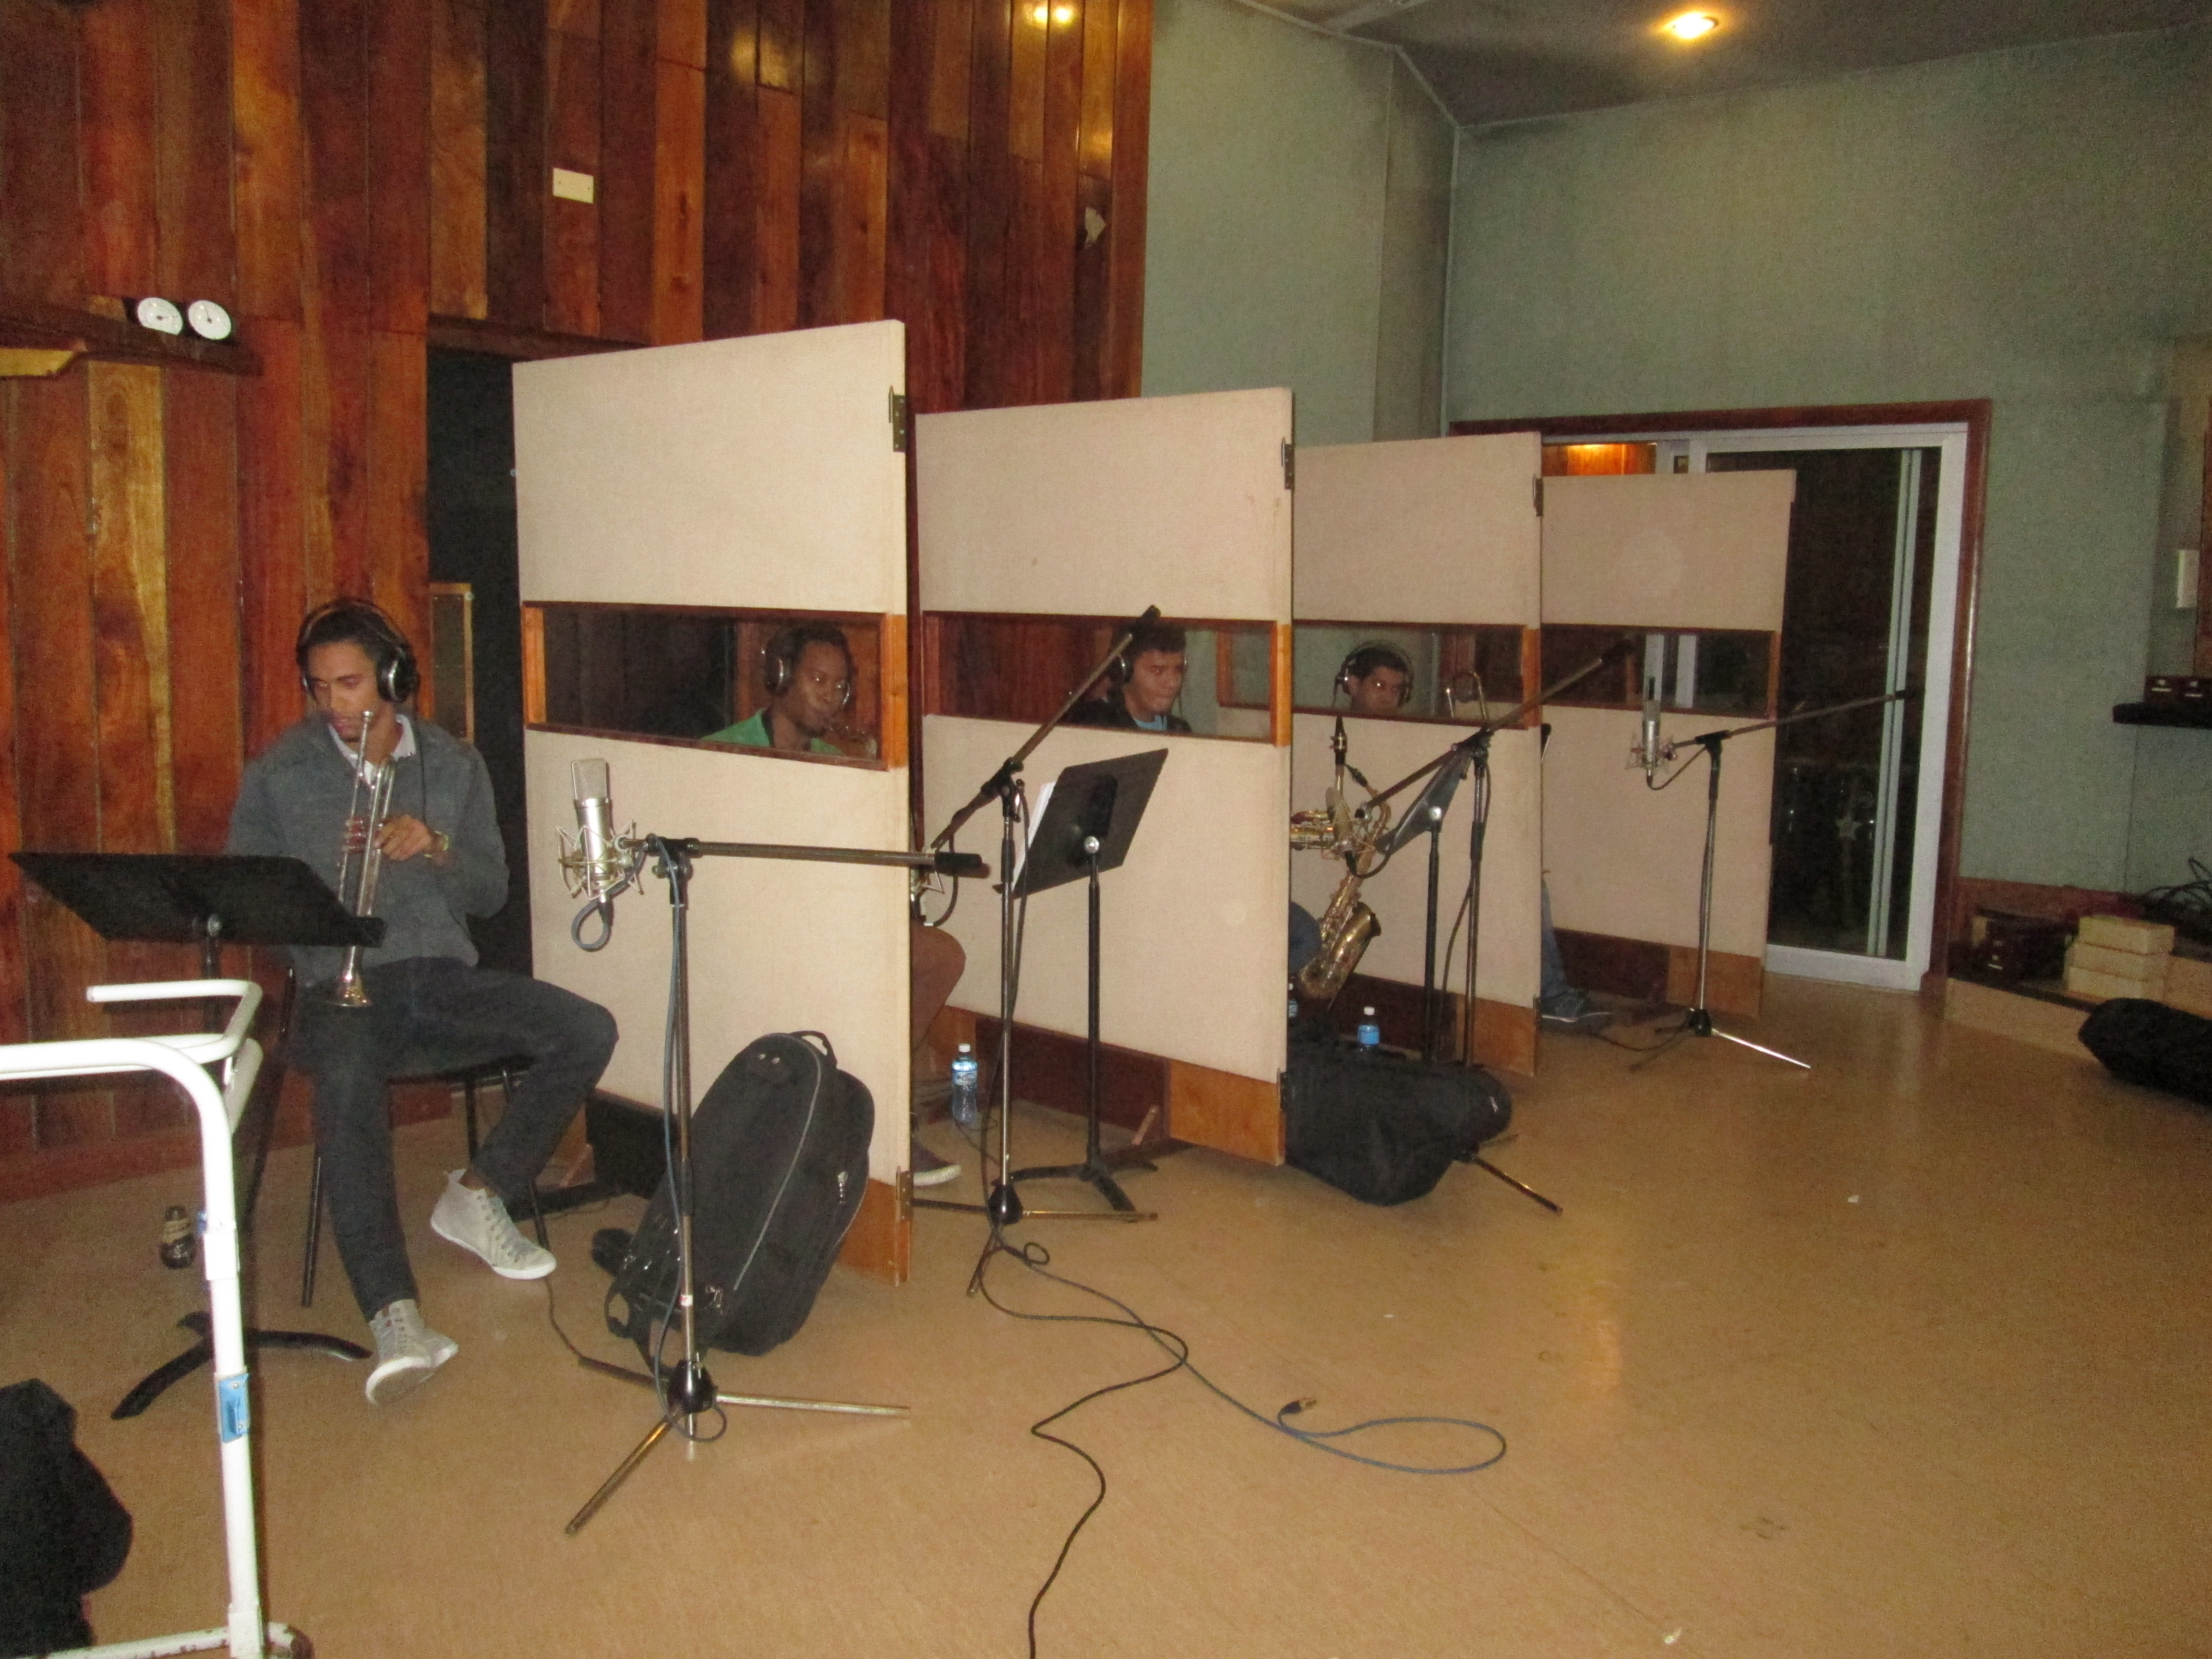 Abdala Studios, December 2015